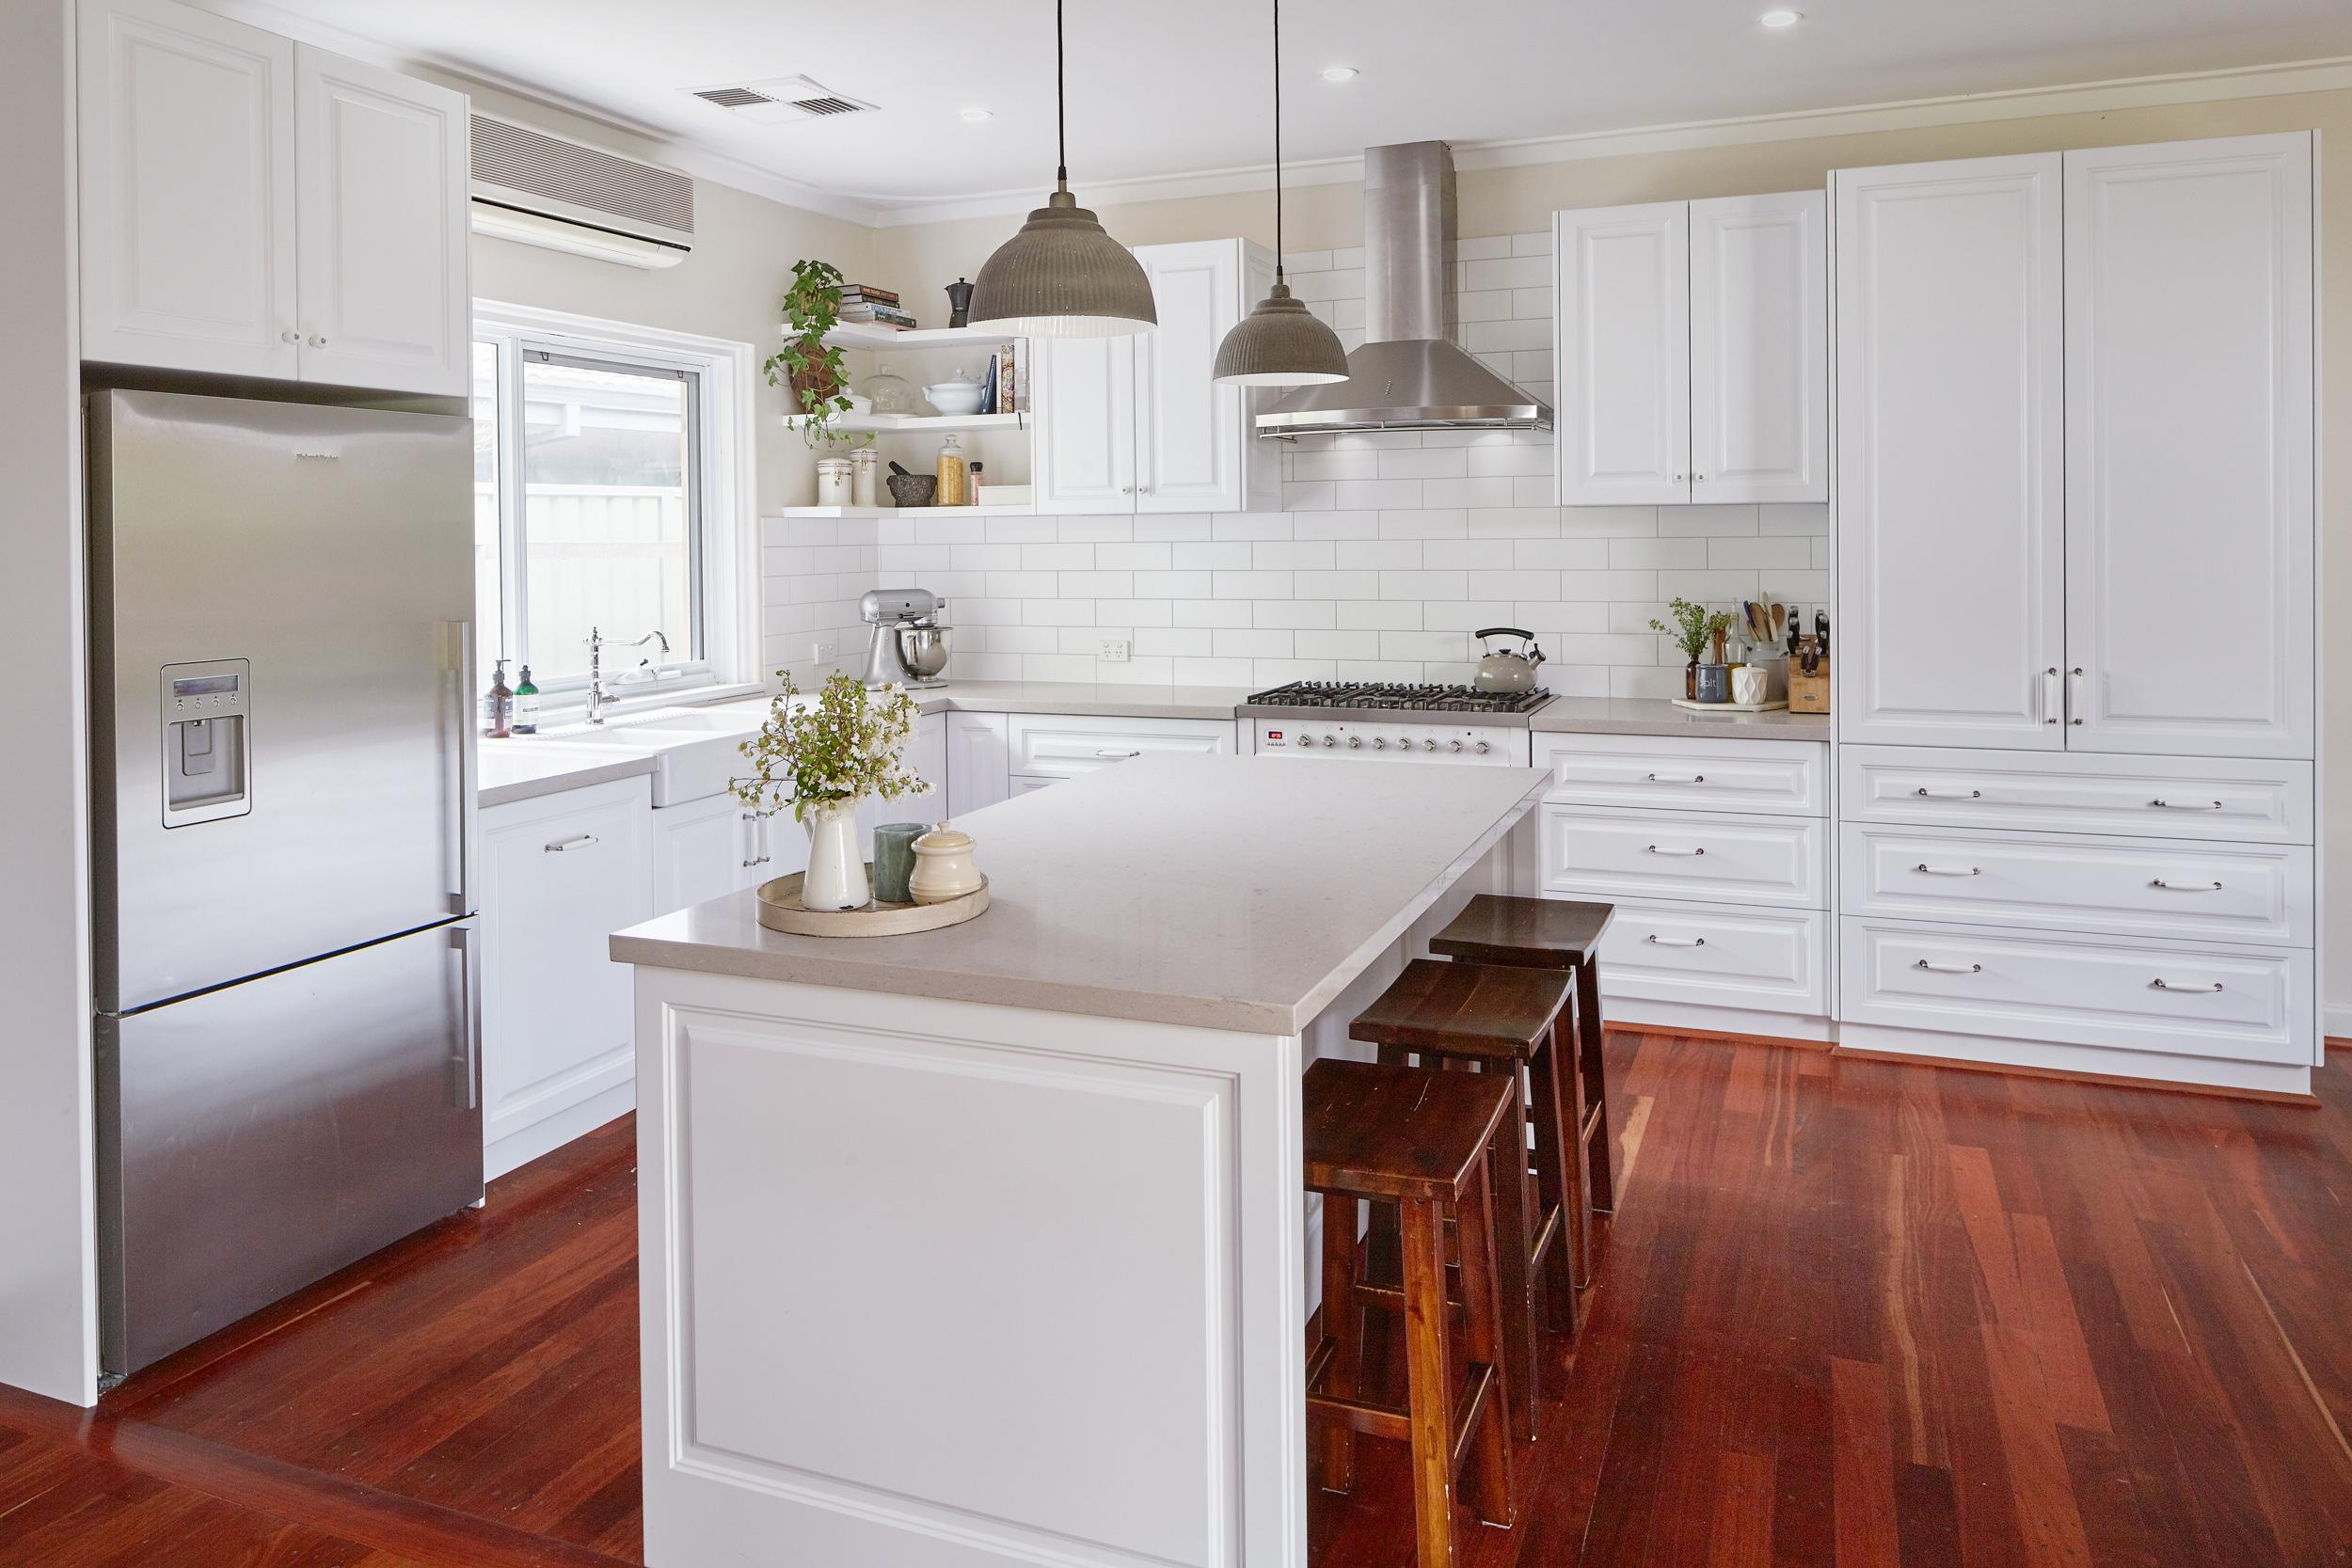 Traditional Kitchen Design Custom Kitchens Bathrooms - oukas.info